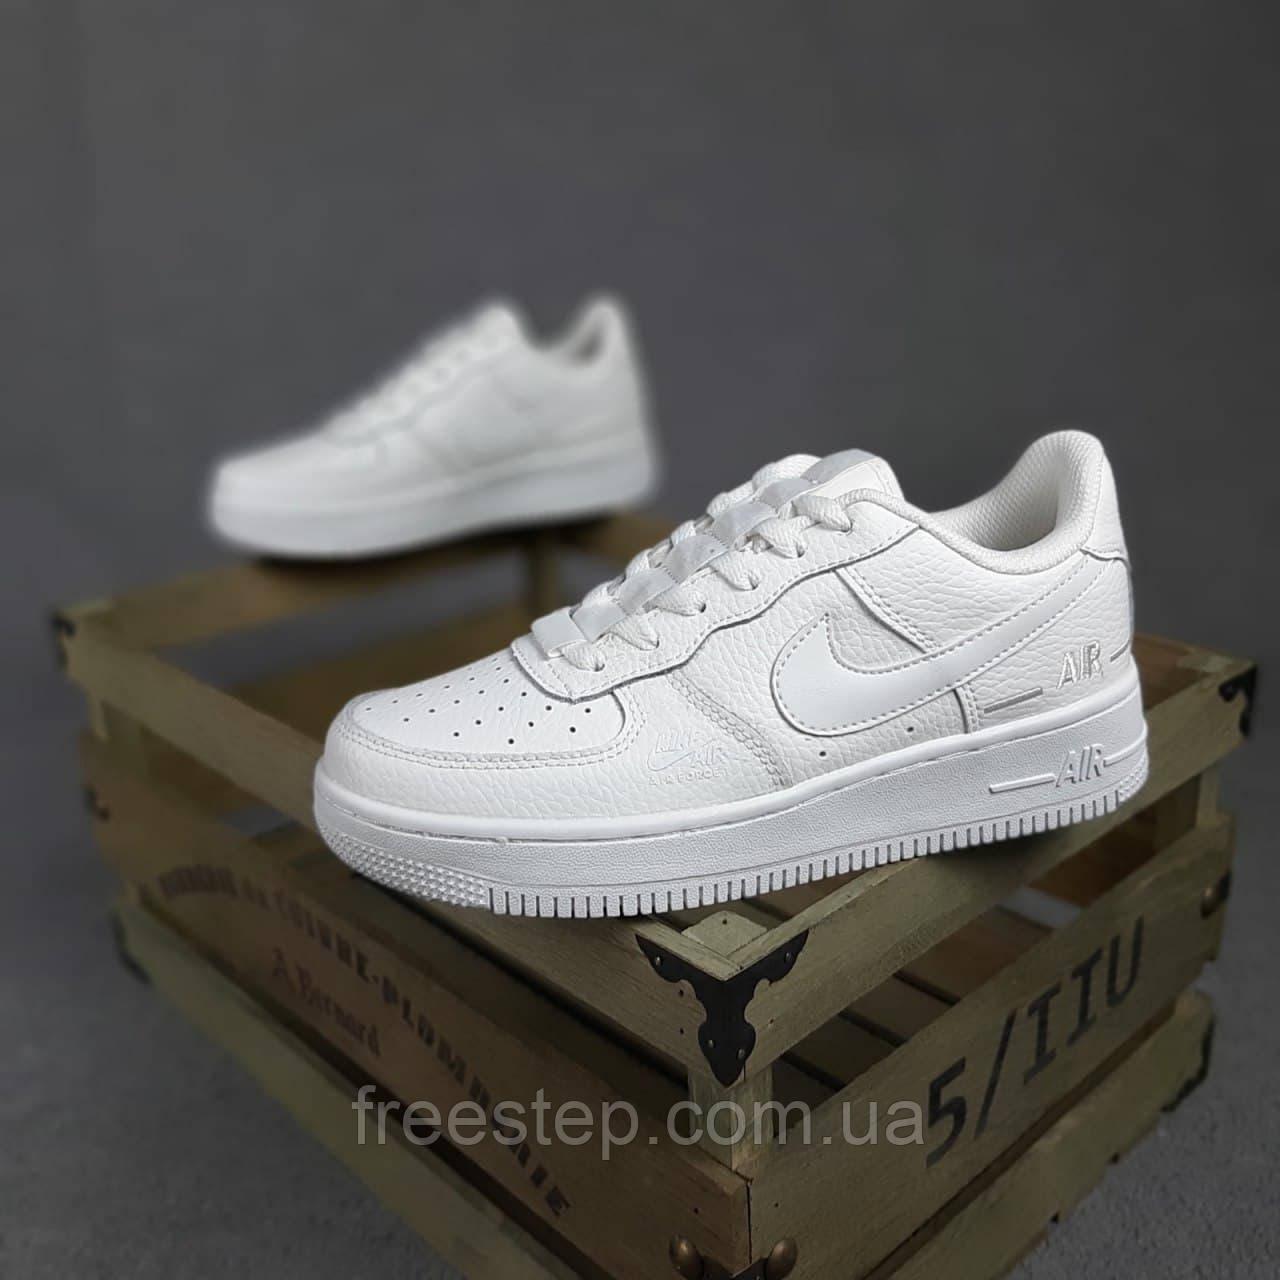 Женские  кроссовки в стиле Nike Air Force 1 Double Air белые